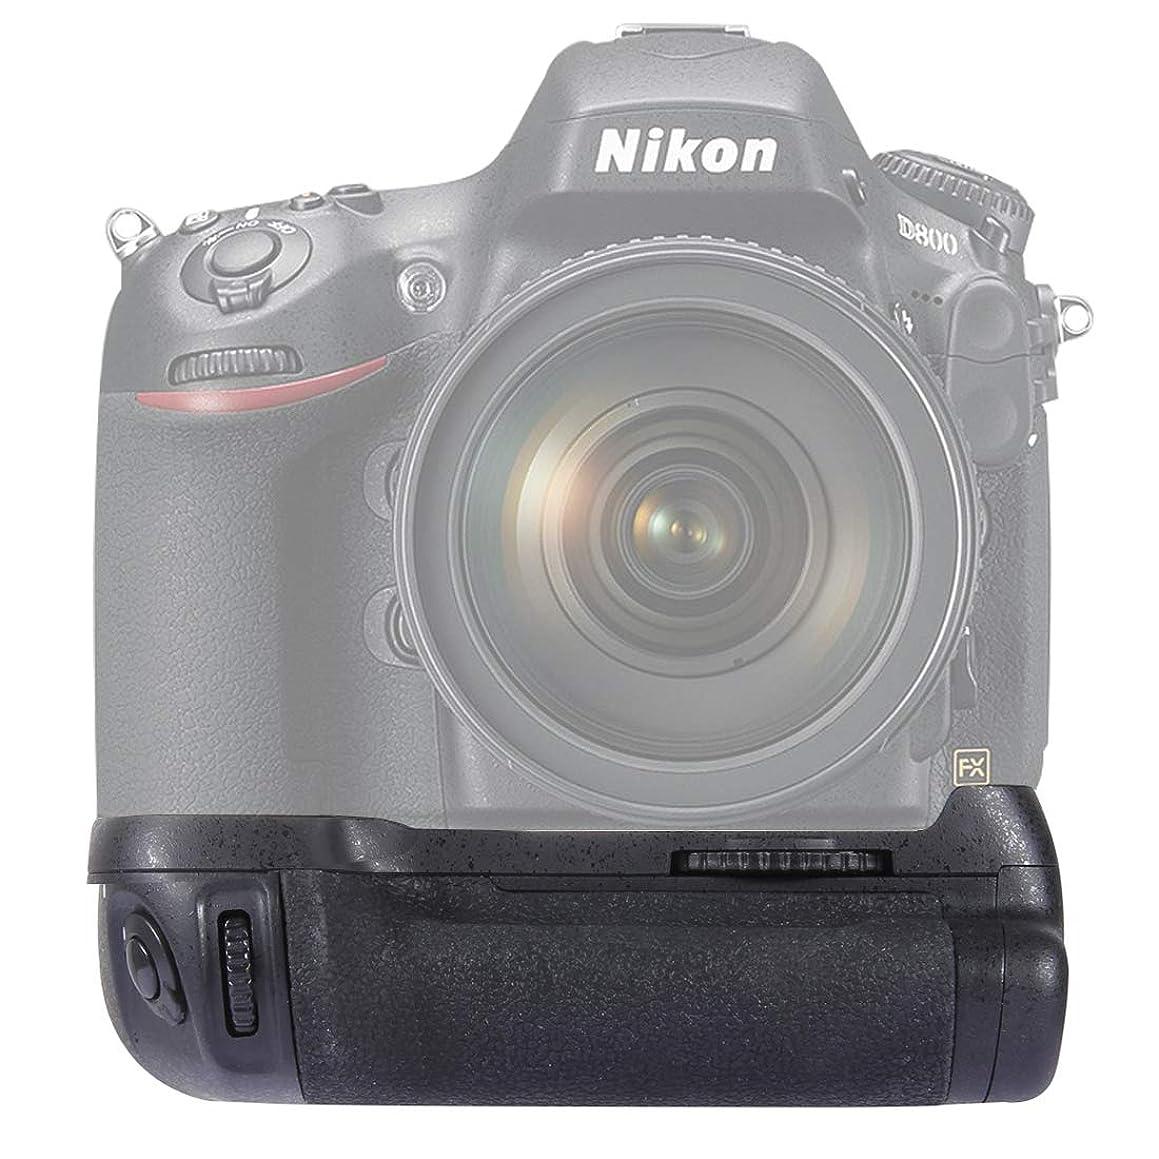 WSJ PULUZ Vertical Camera Battery Grip for Nikon D800 / D800E / D810 Digital SLR Camera(Black)